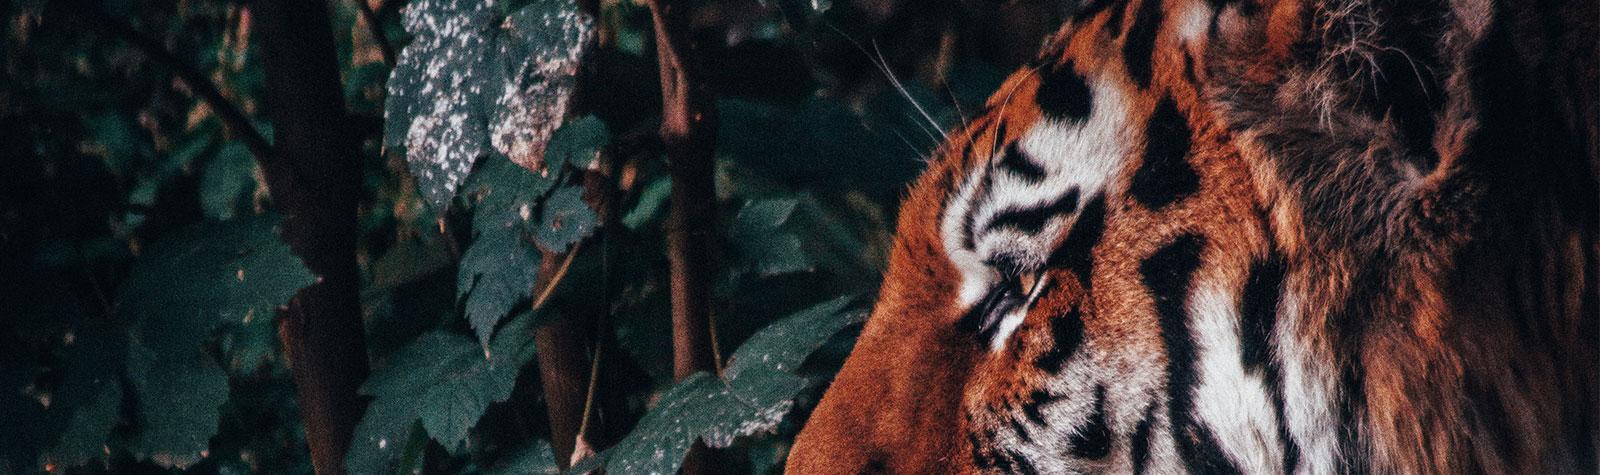 Porque tatuamos tigres?